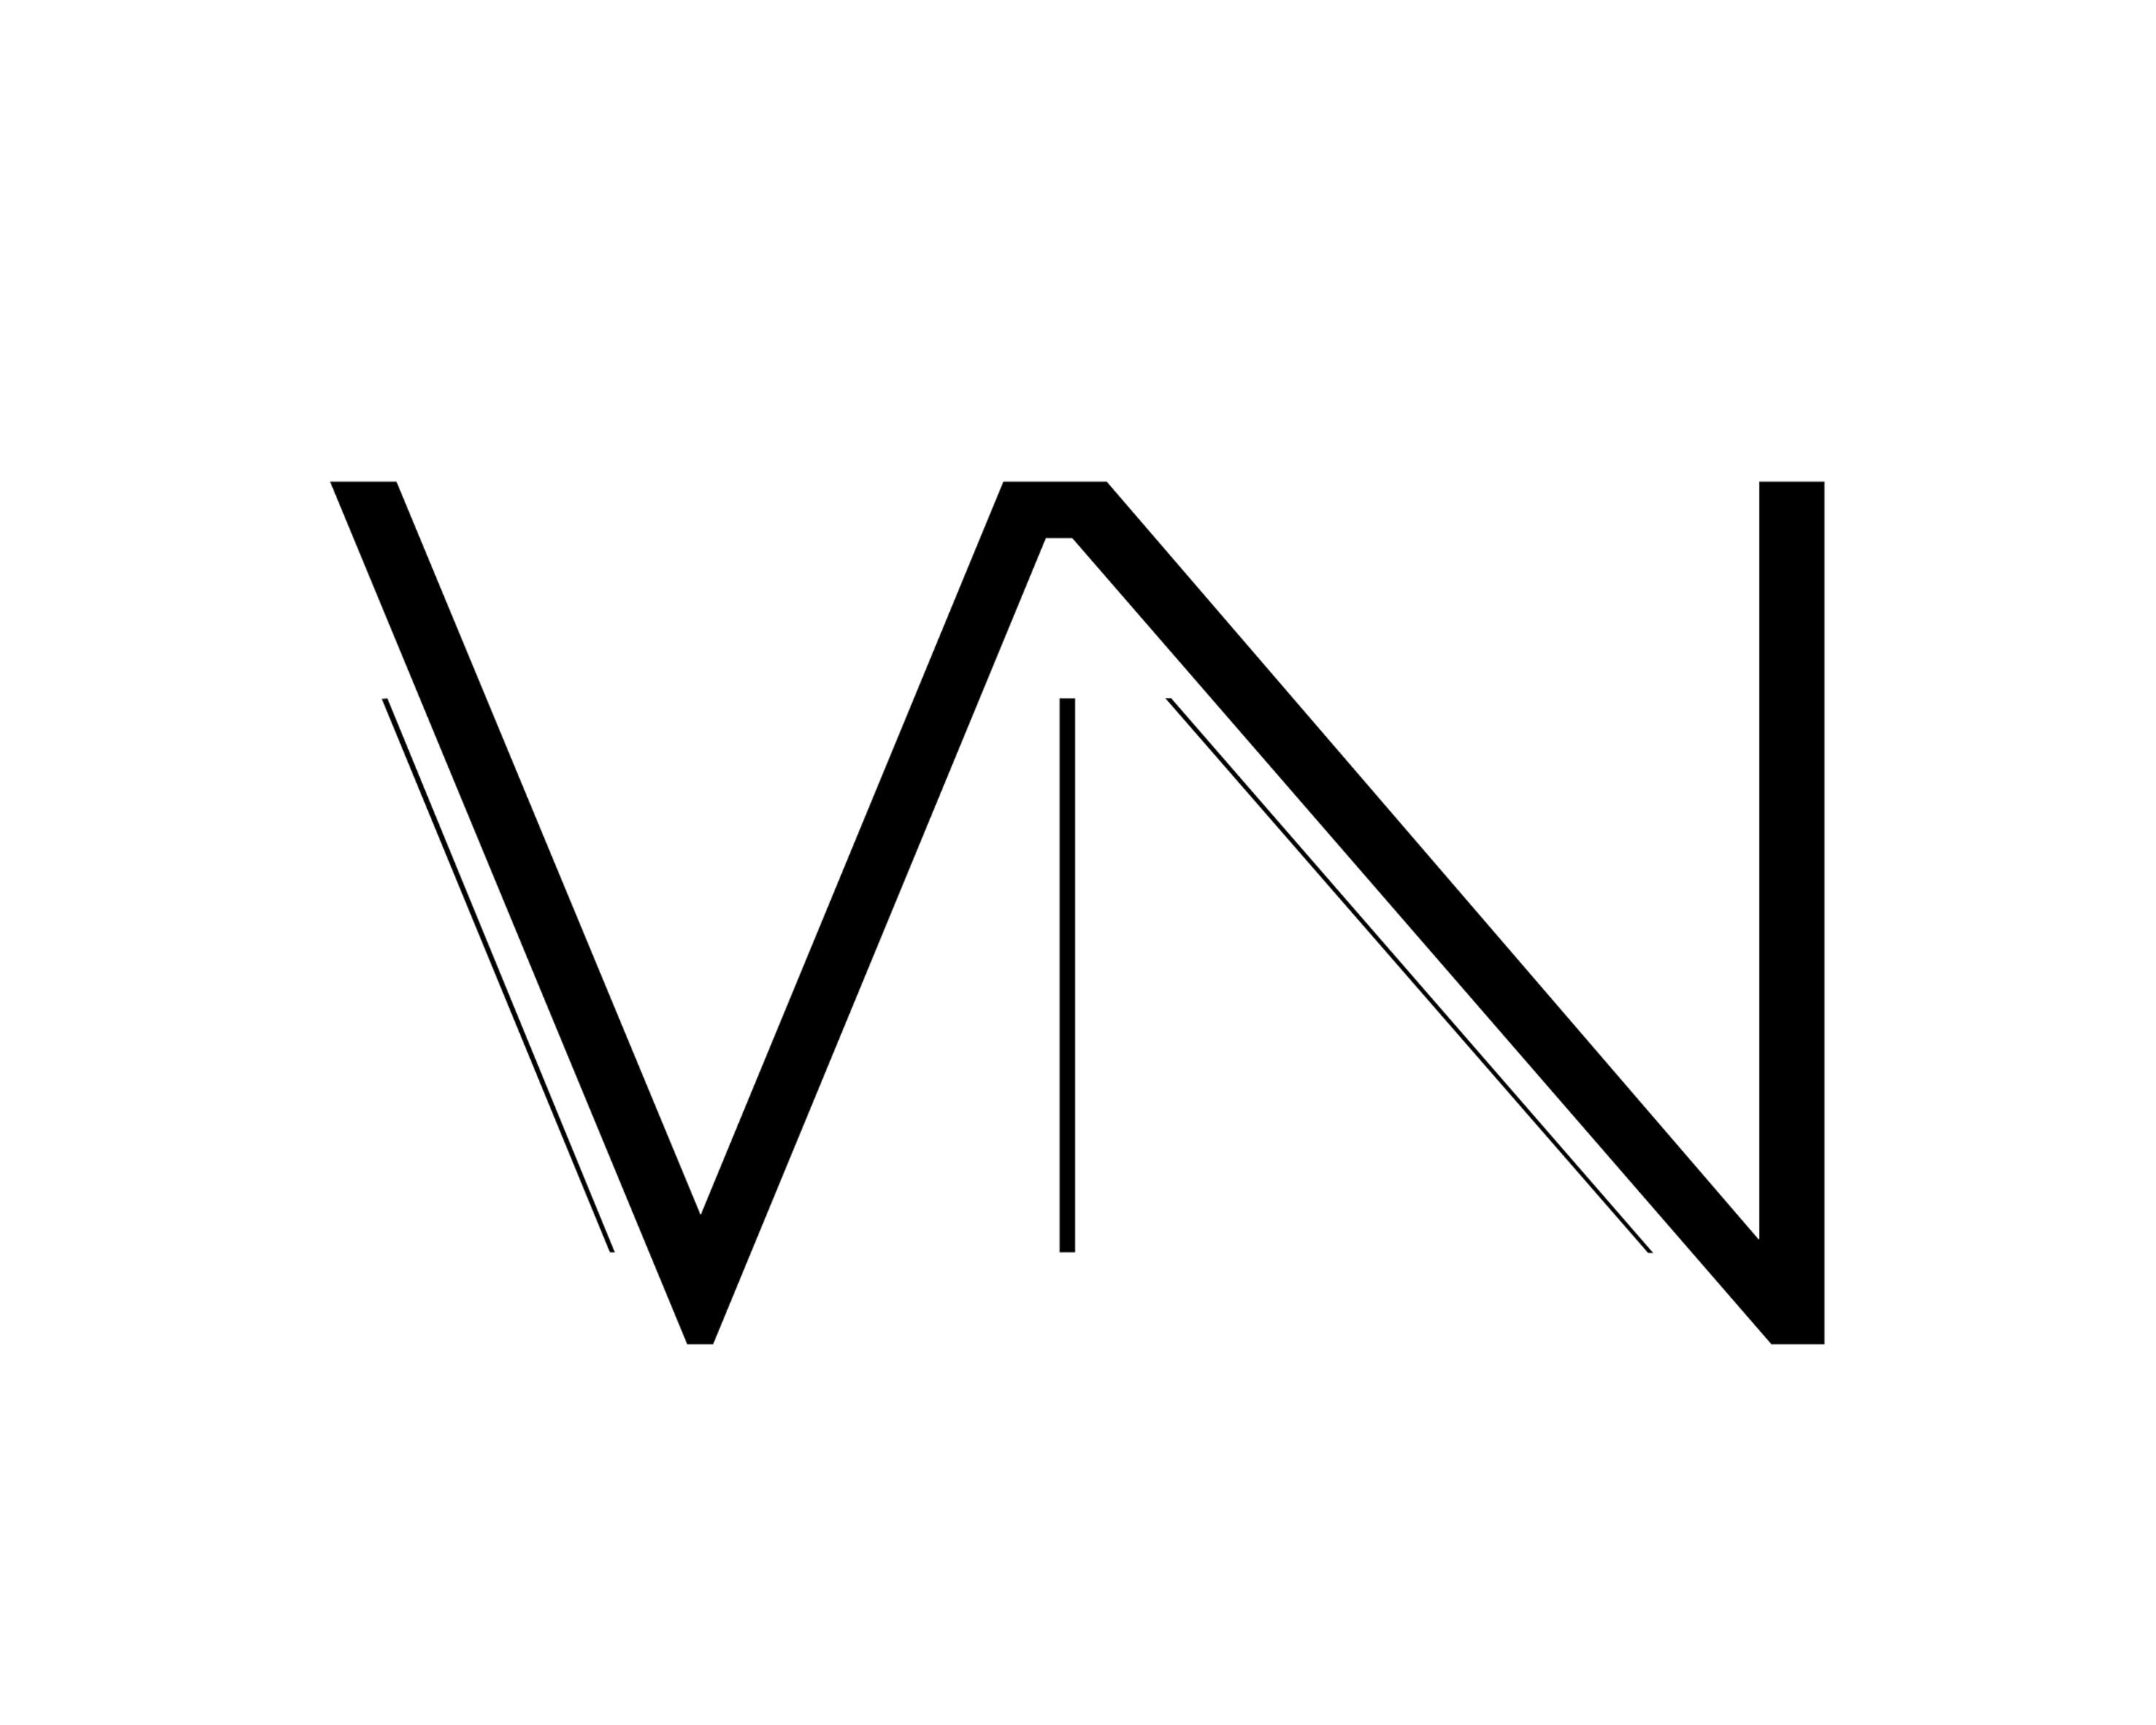 VN2 2